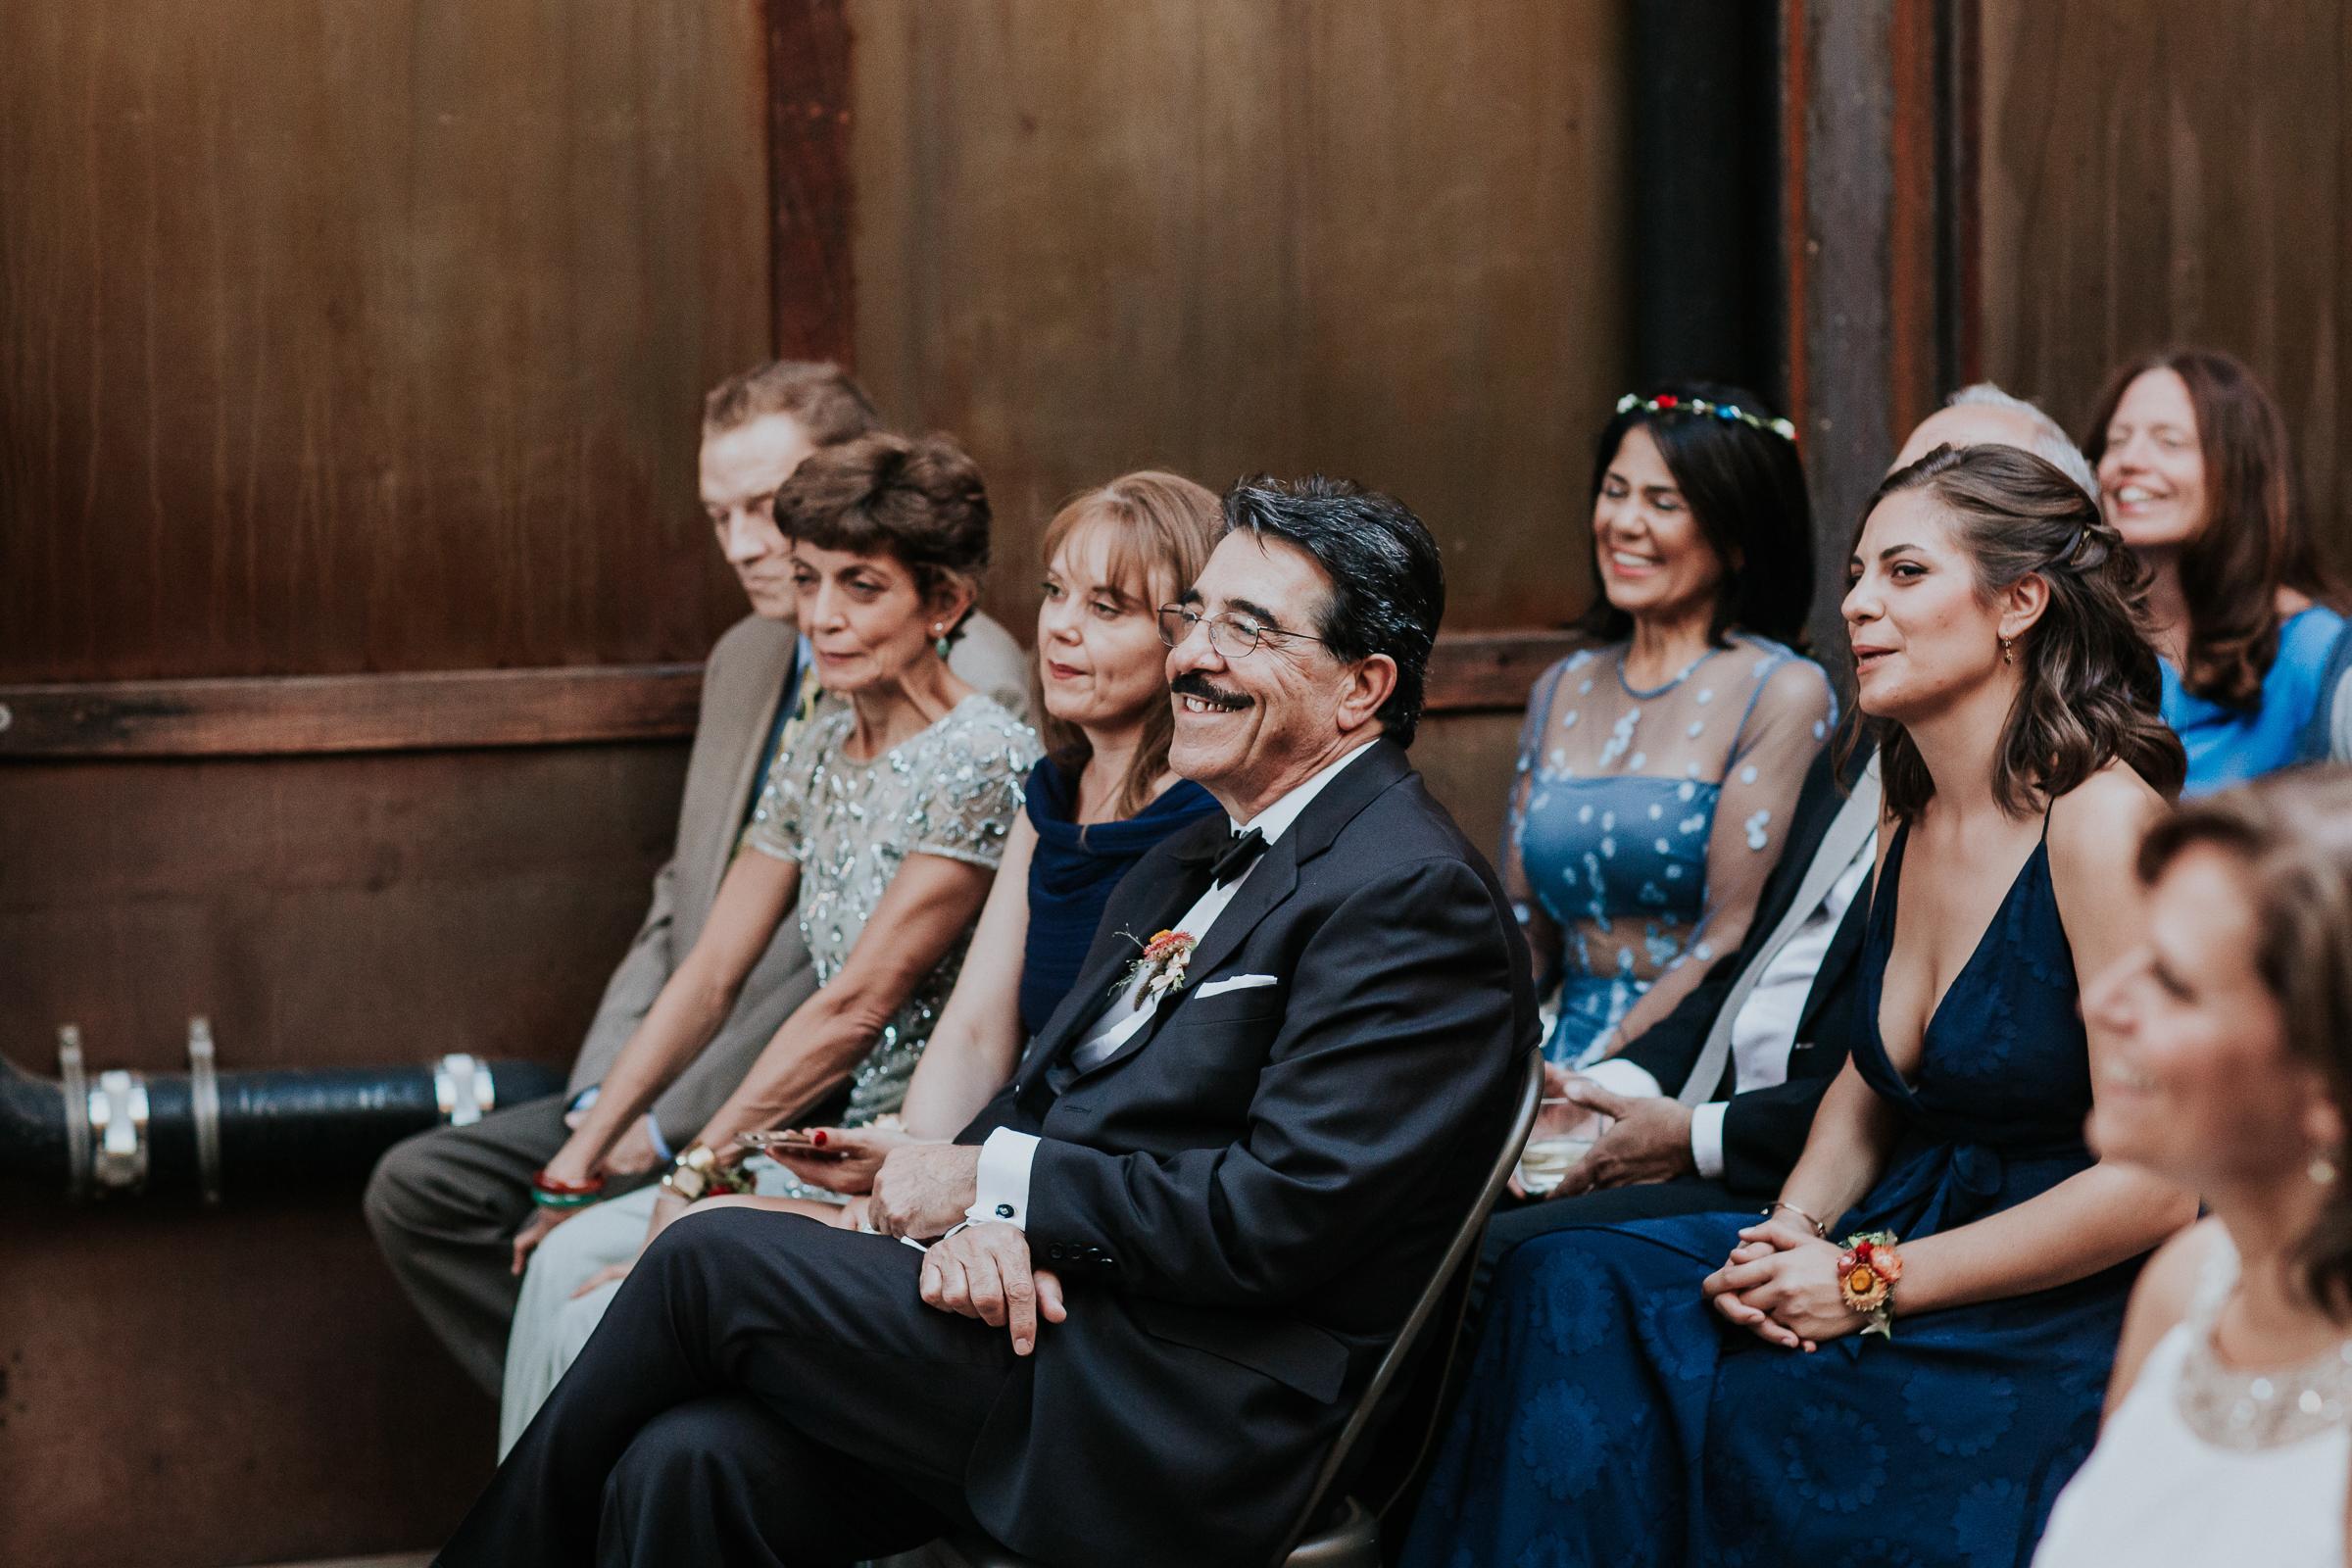 Brooklyn-Winery-NYC-Editorial-Documentary-Wedding-Photographer-Gina-Oli-76.jpg